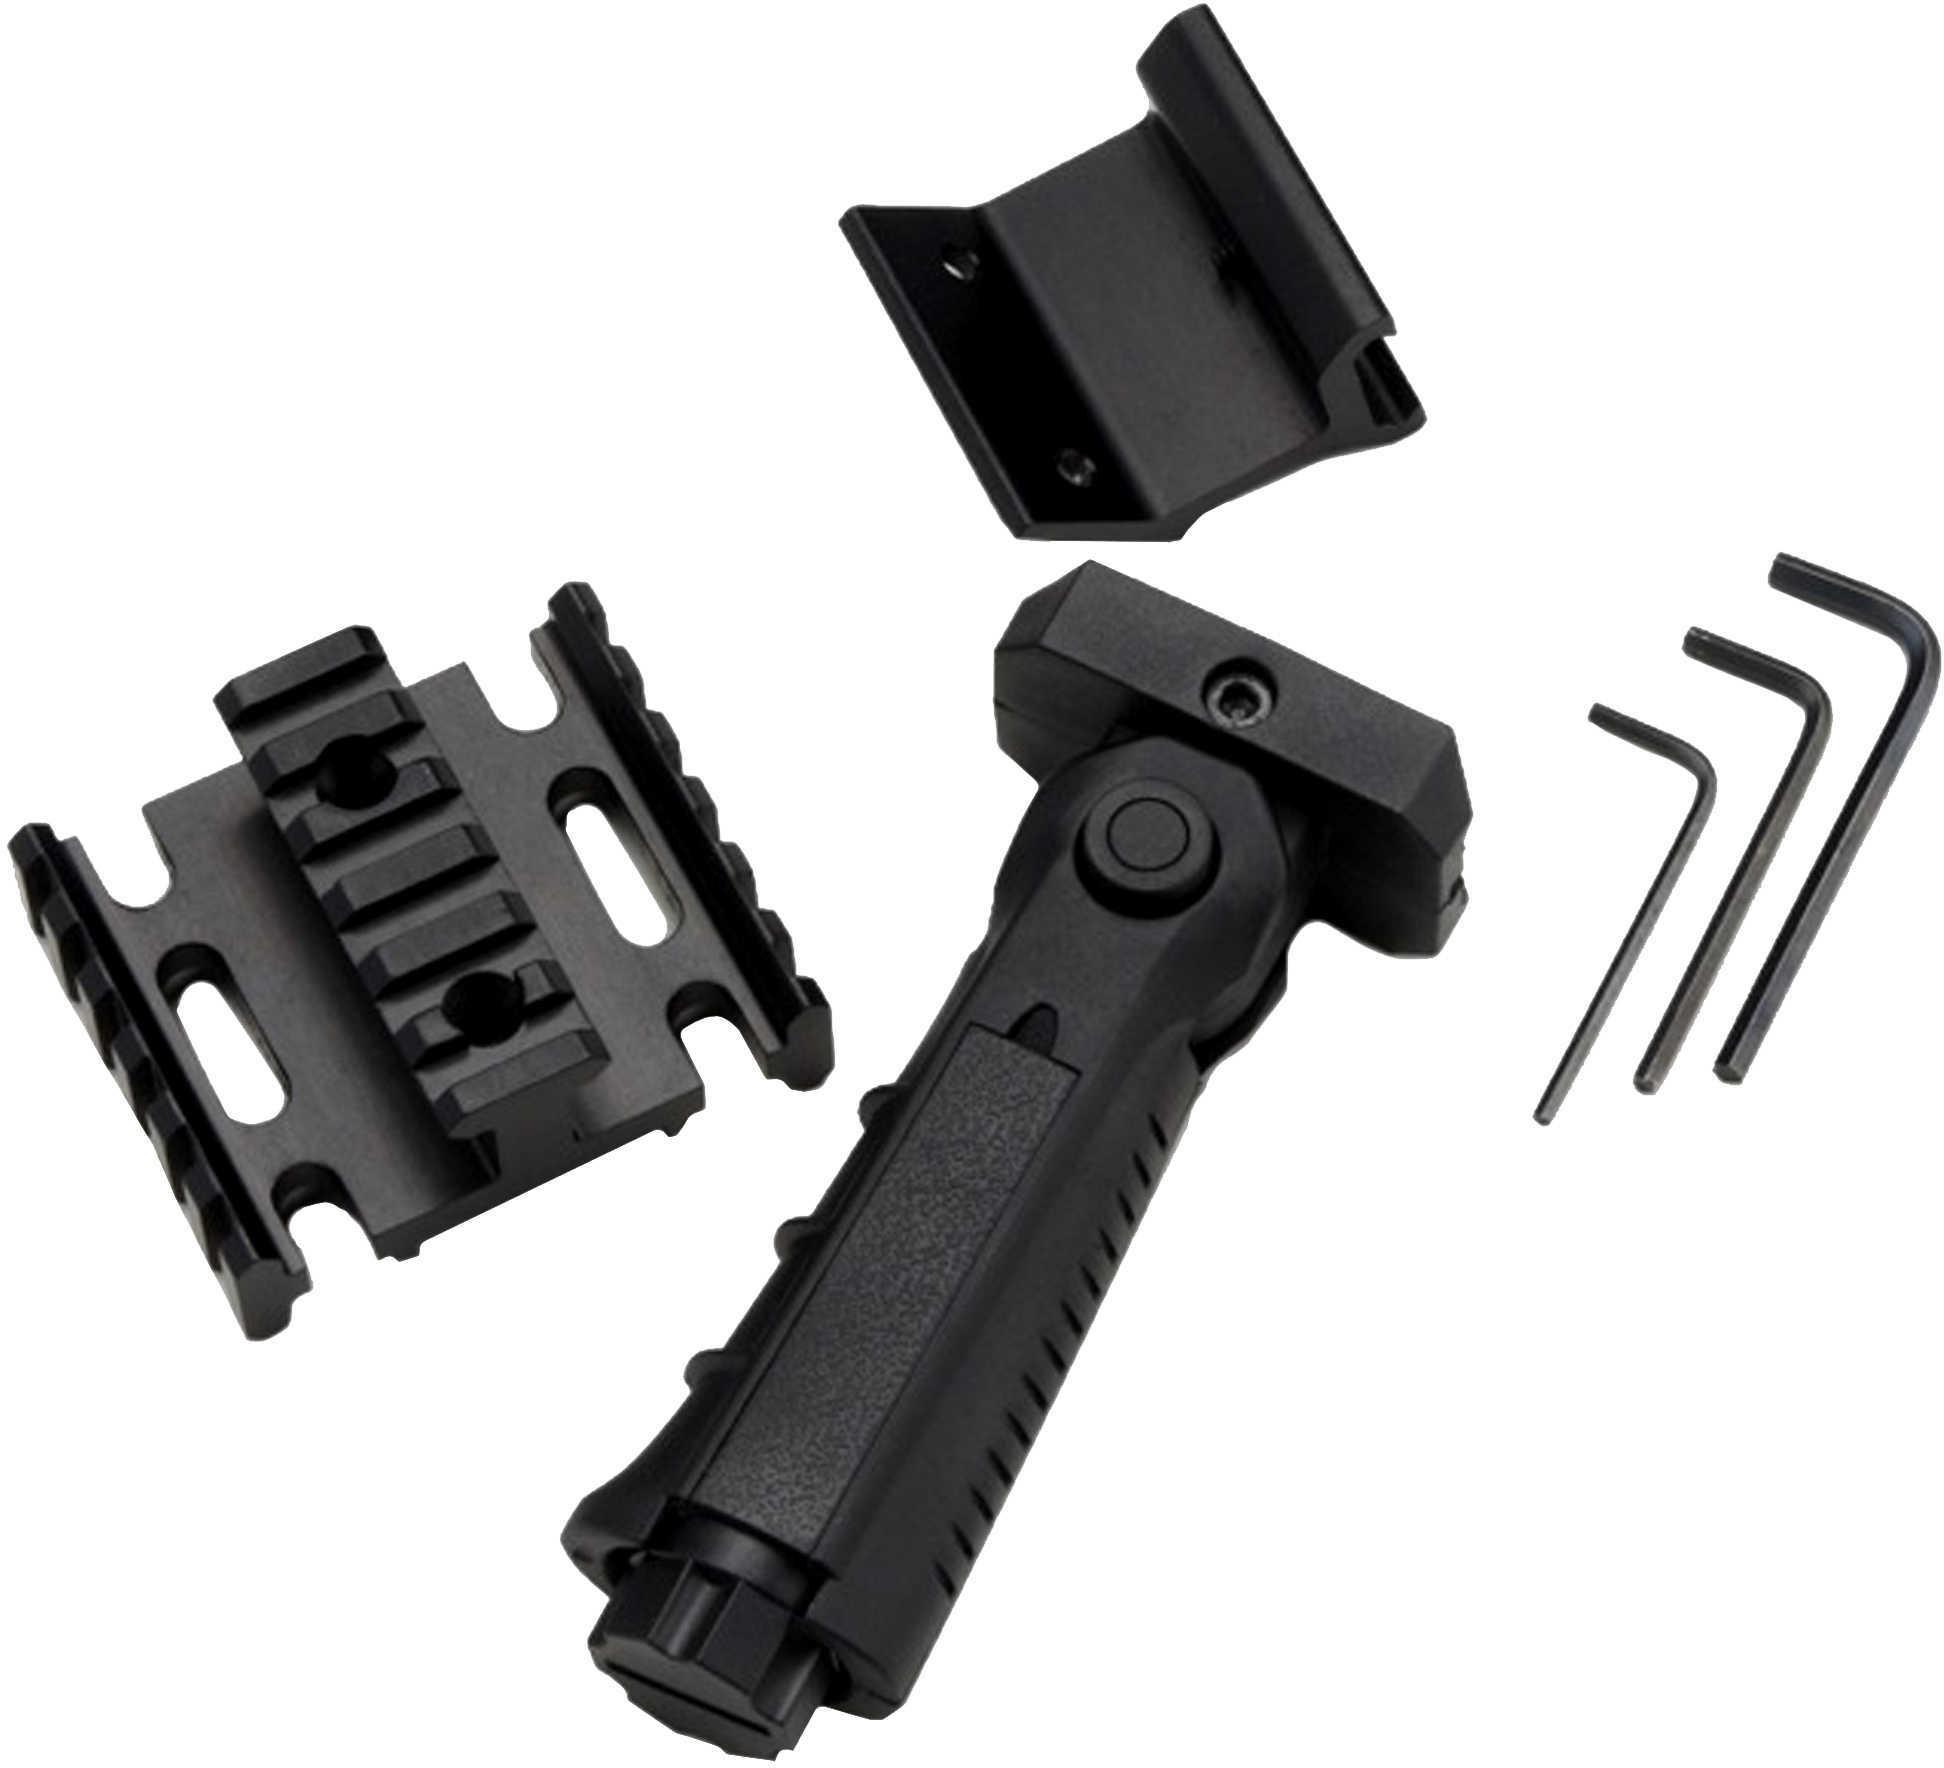 Excalibur Tac-Pac, 3 Side Picatinny Rail,Quiver Bracket,Pistol Grip Md: 7015